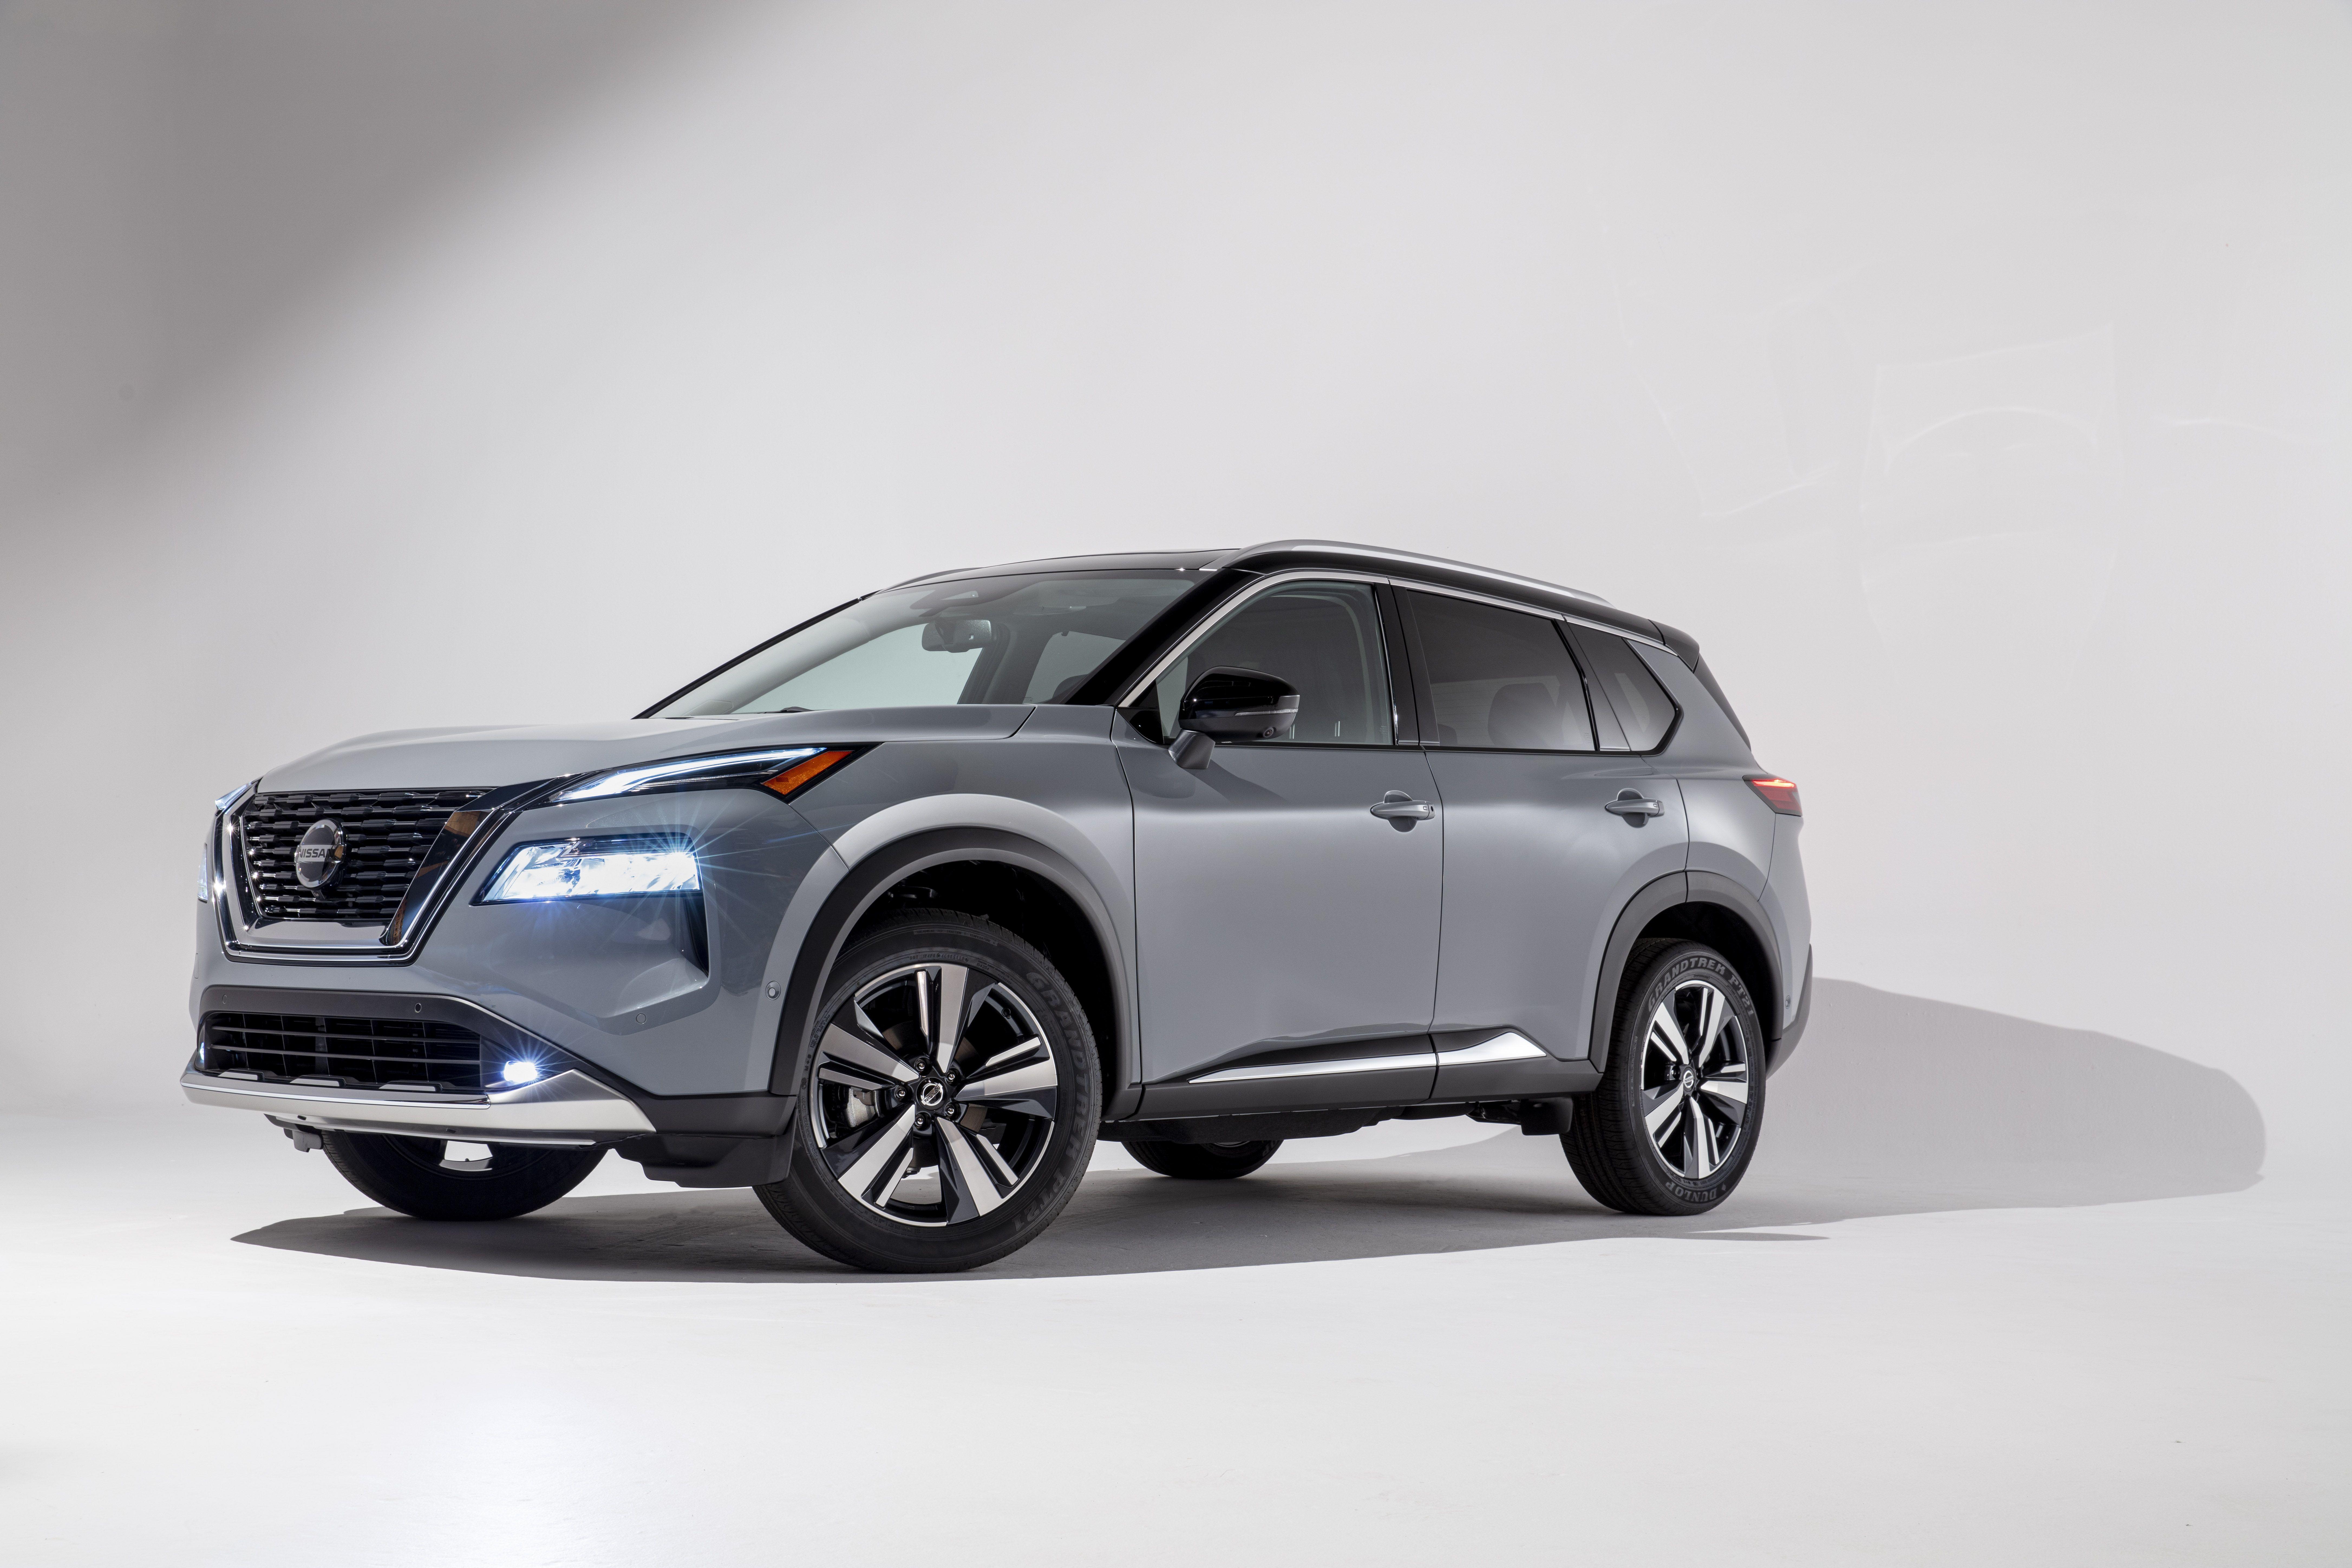 2021 Nissan Rogue Looks Like A Big Improvement